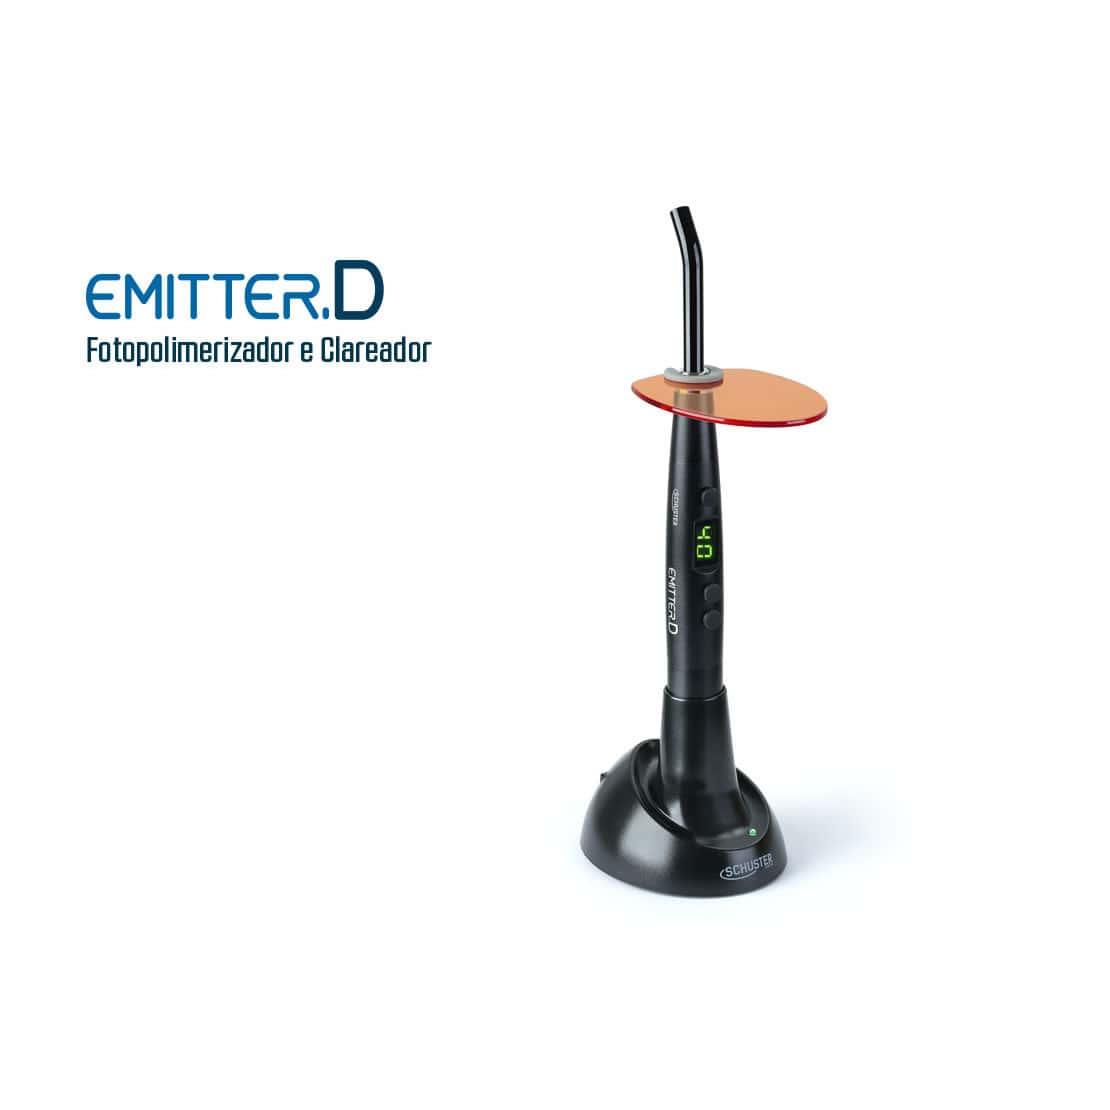 Fotopolimerizador Emitter D Wireless (Sem fio) - Schuster